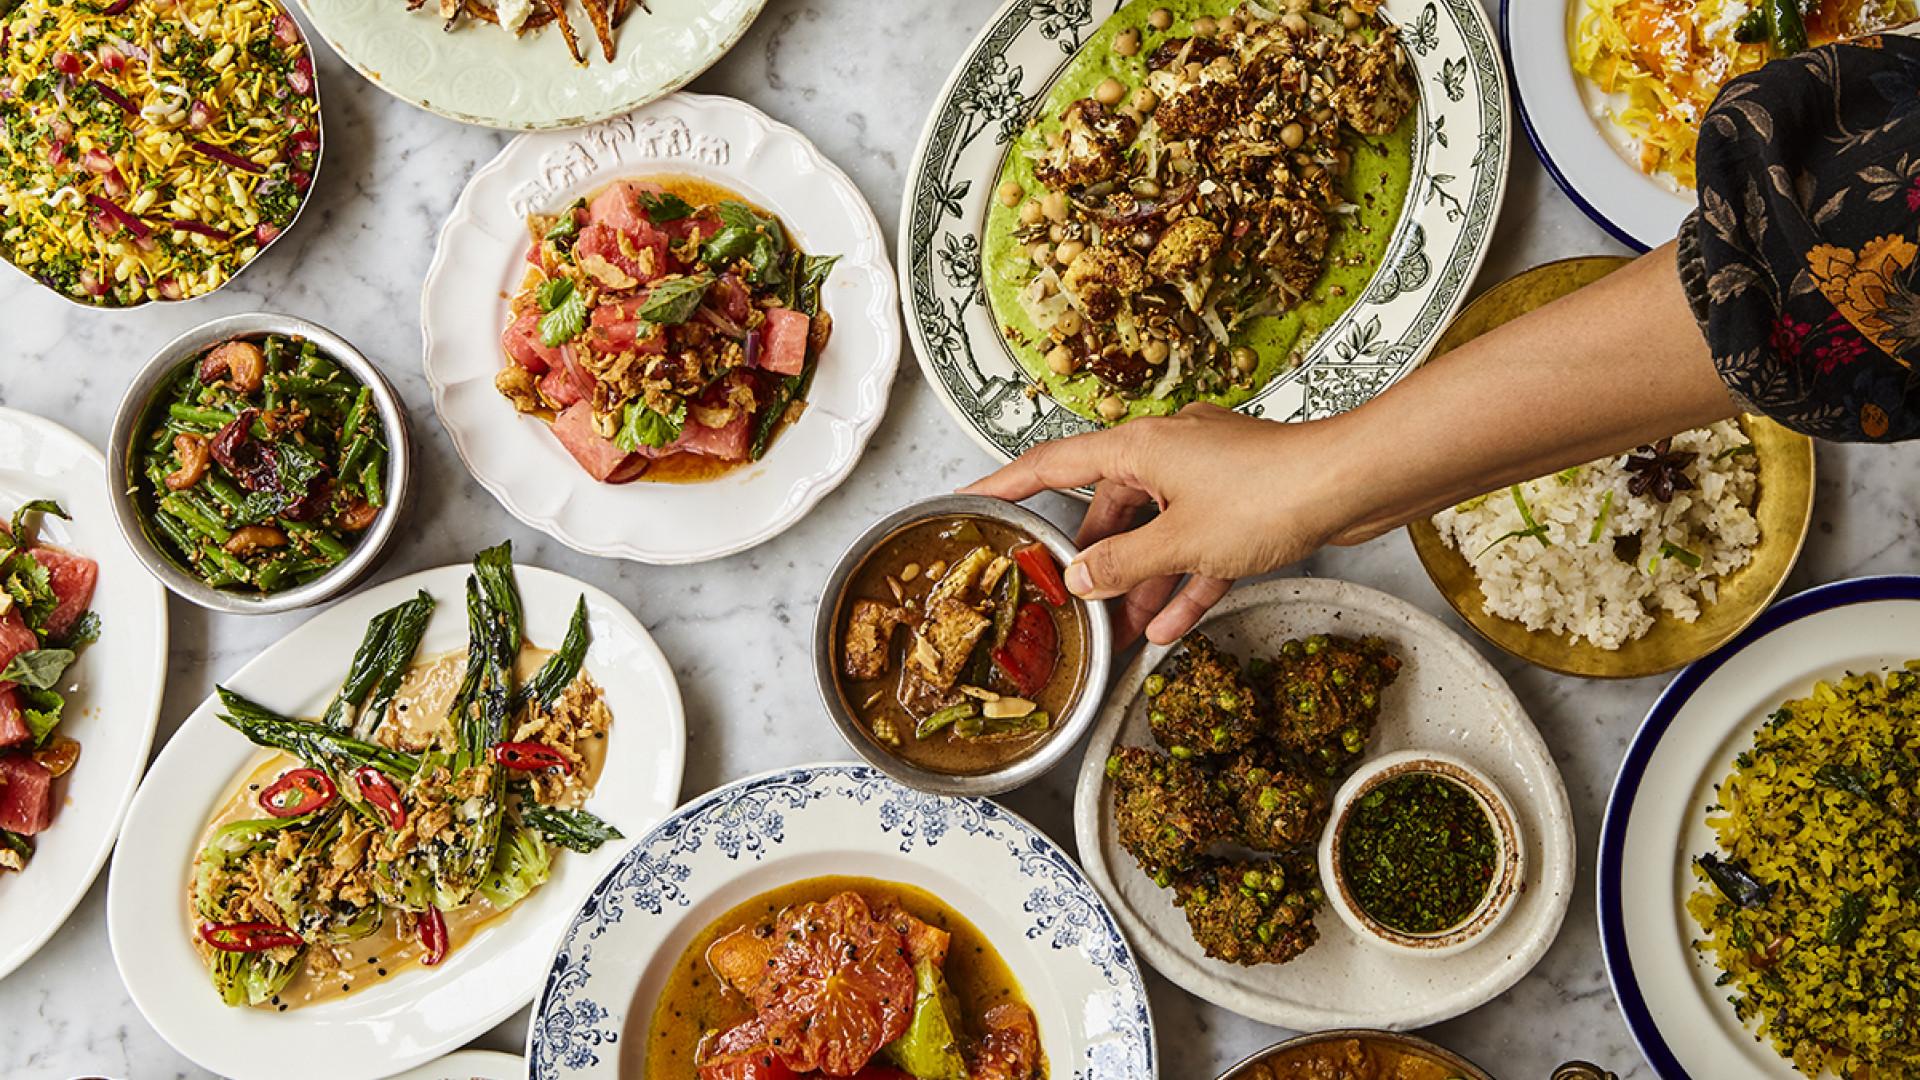 Vegan recipe and meal kits: Comfort and Joy by Jikoni